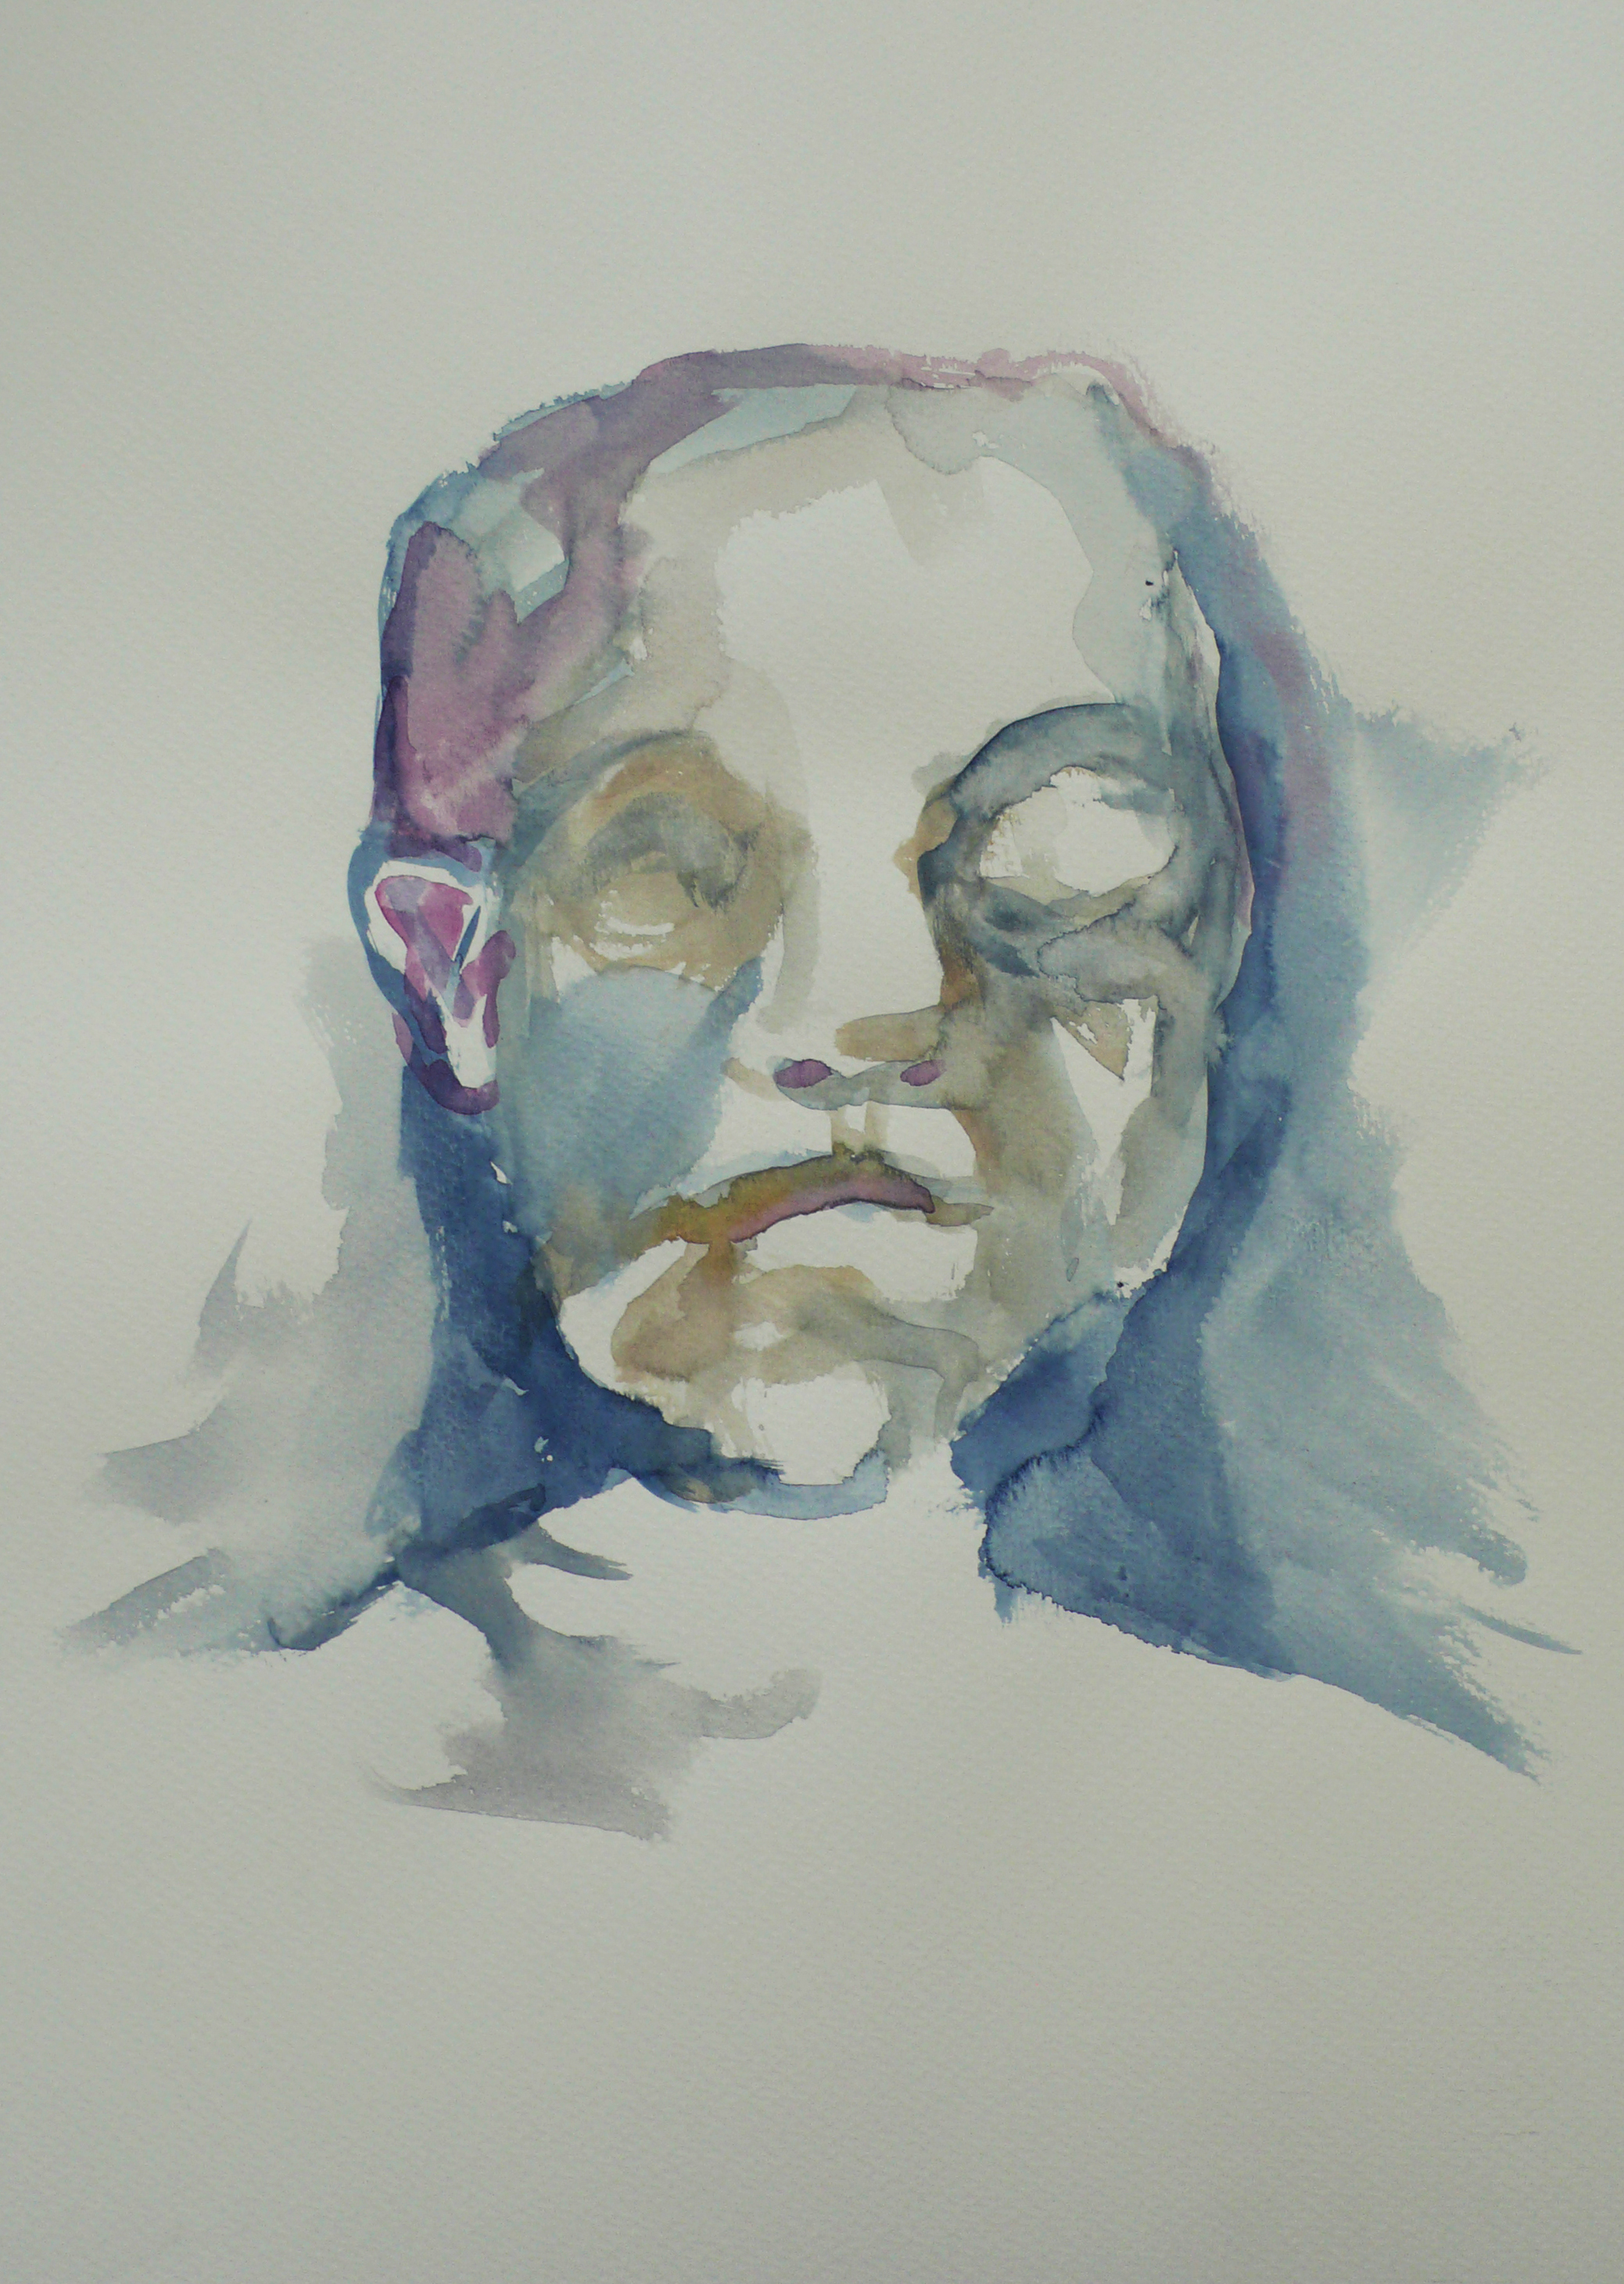 Aquarell, 60x42cm, 2015